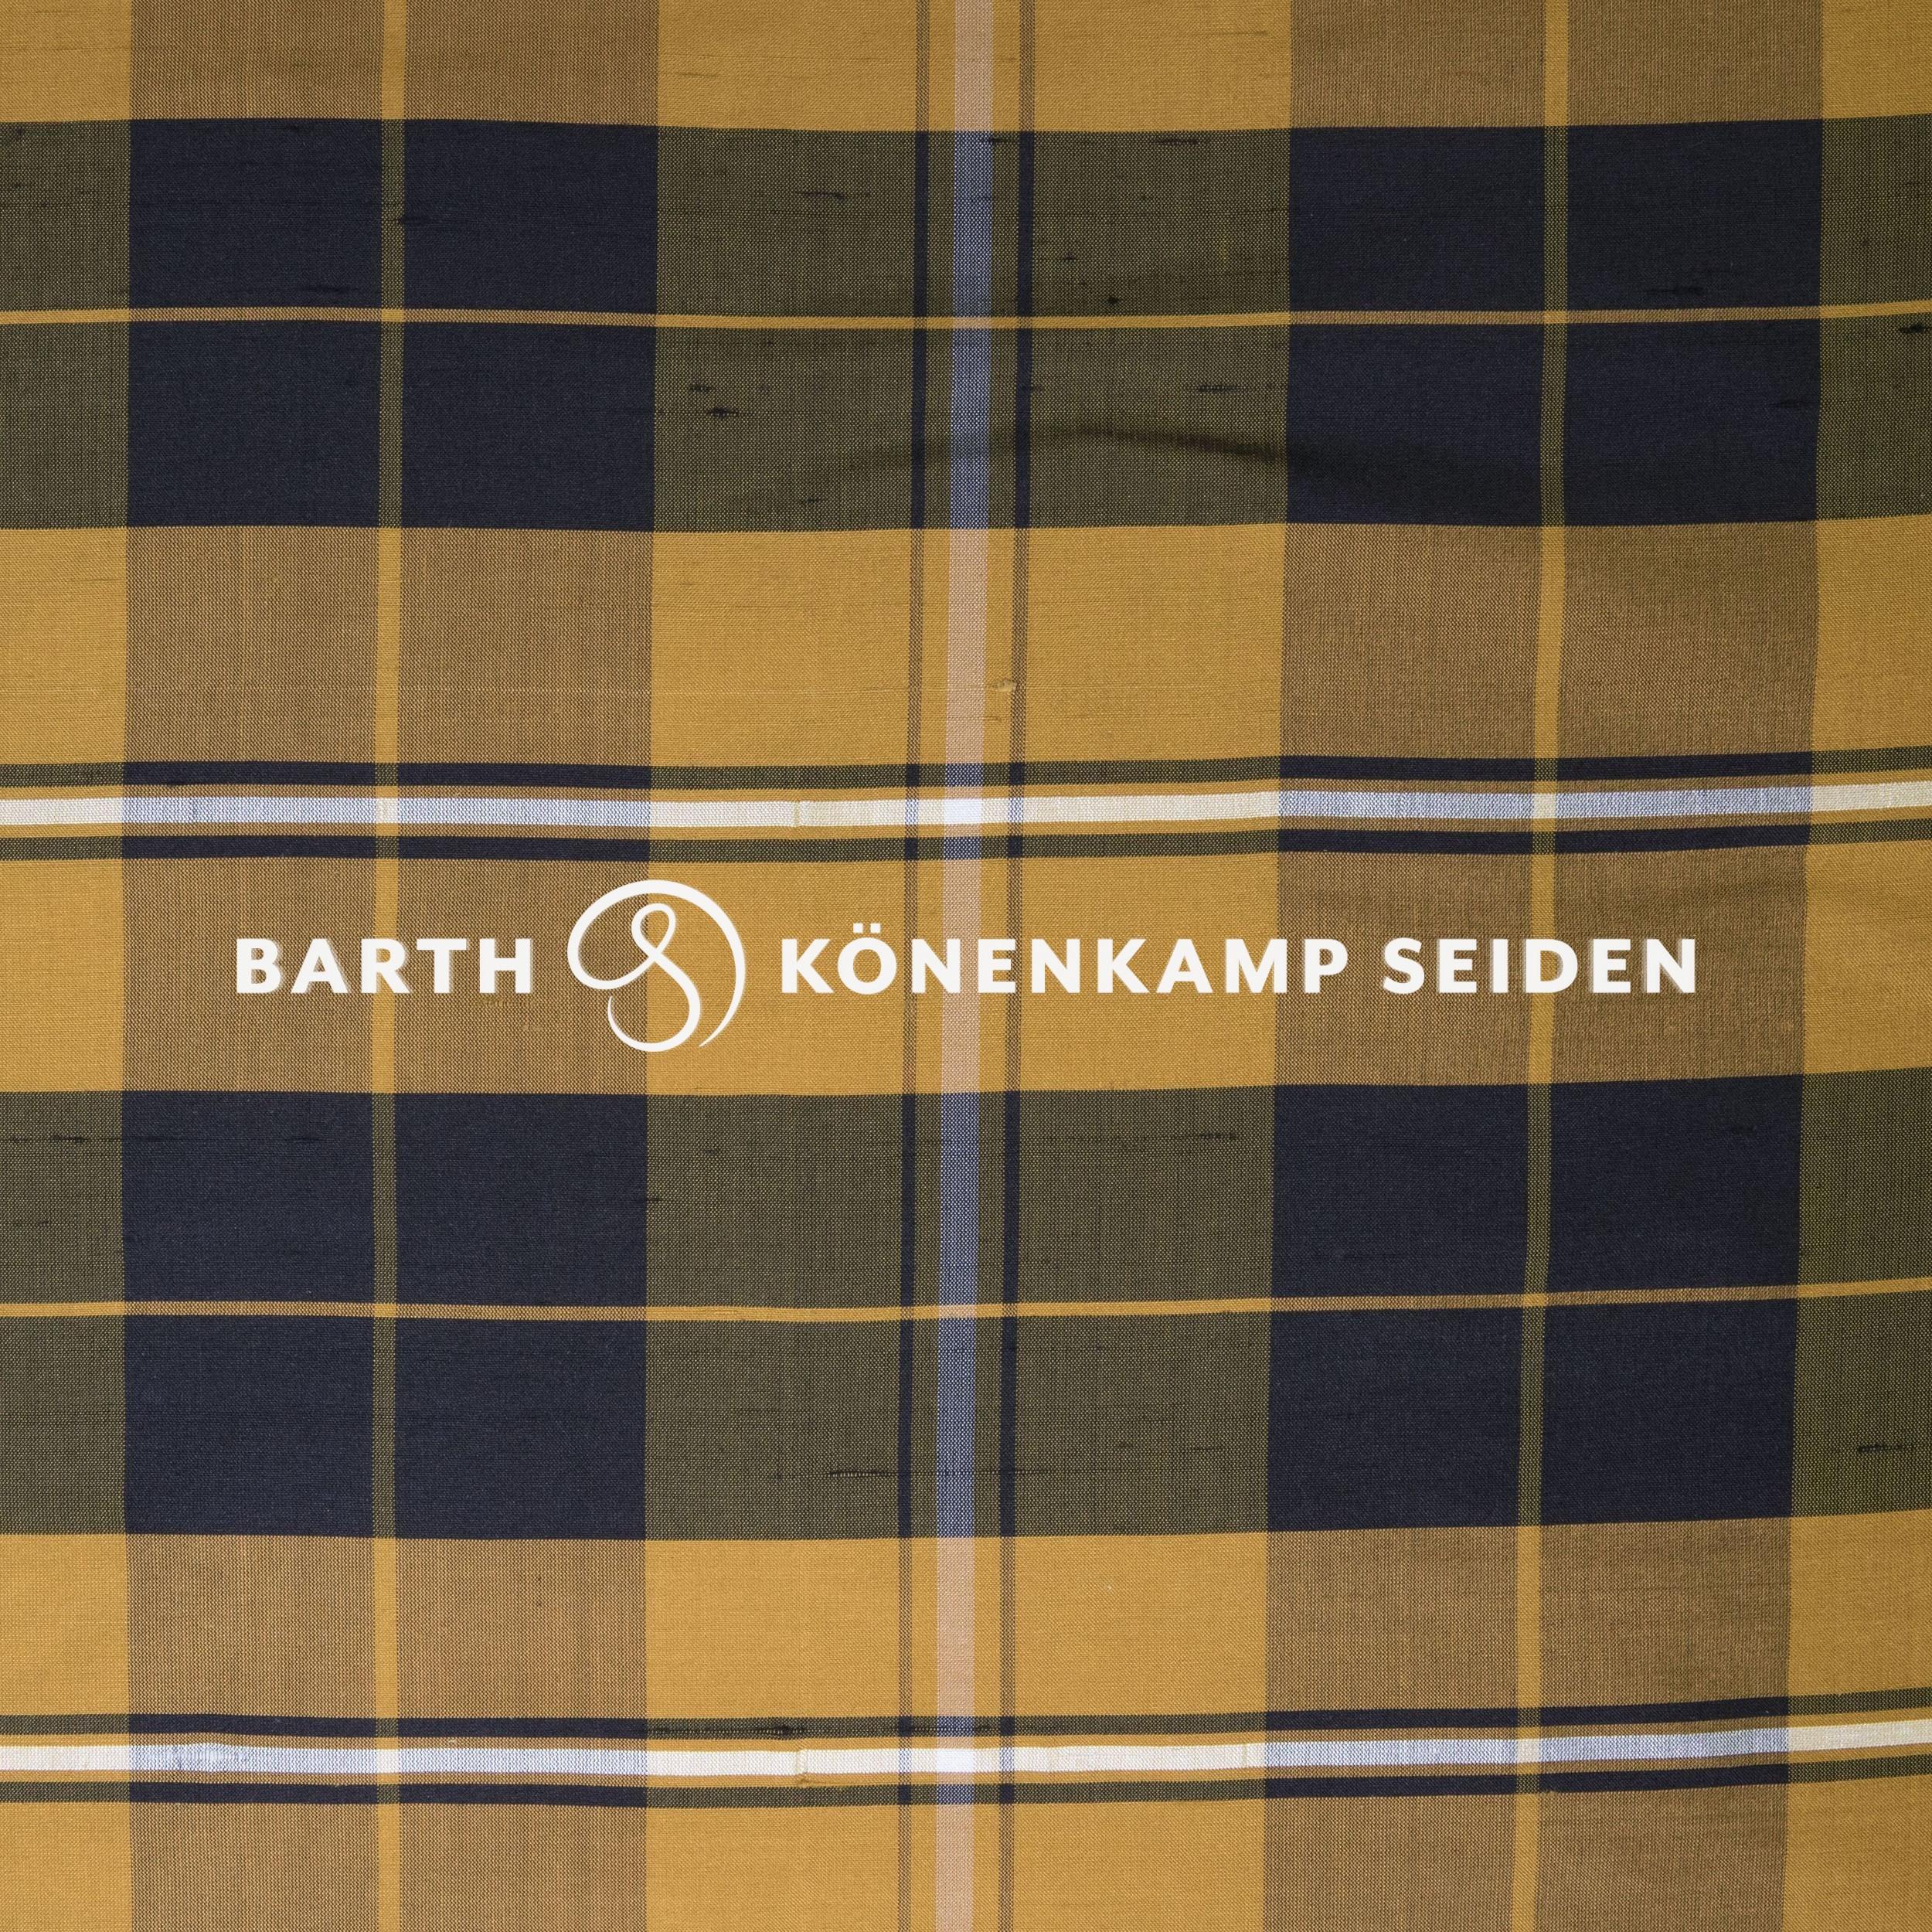 3090B-101 / Doupion silk checked